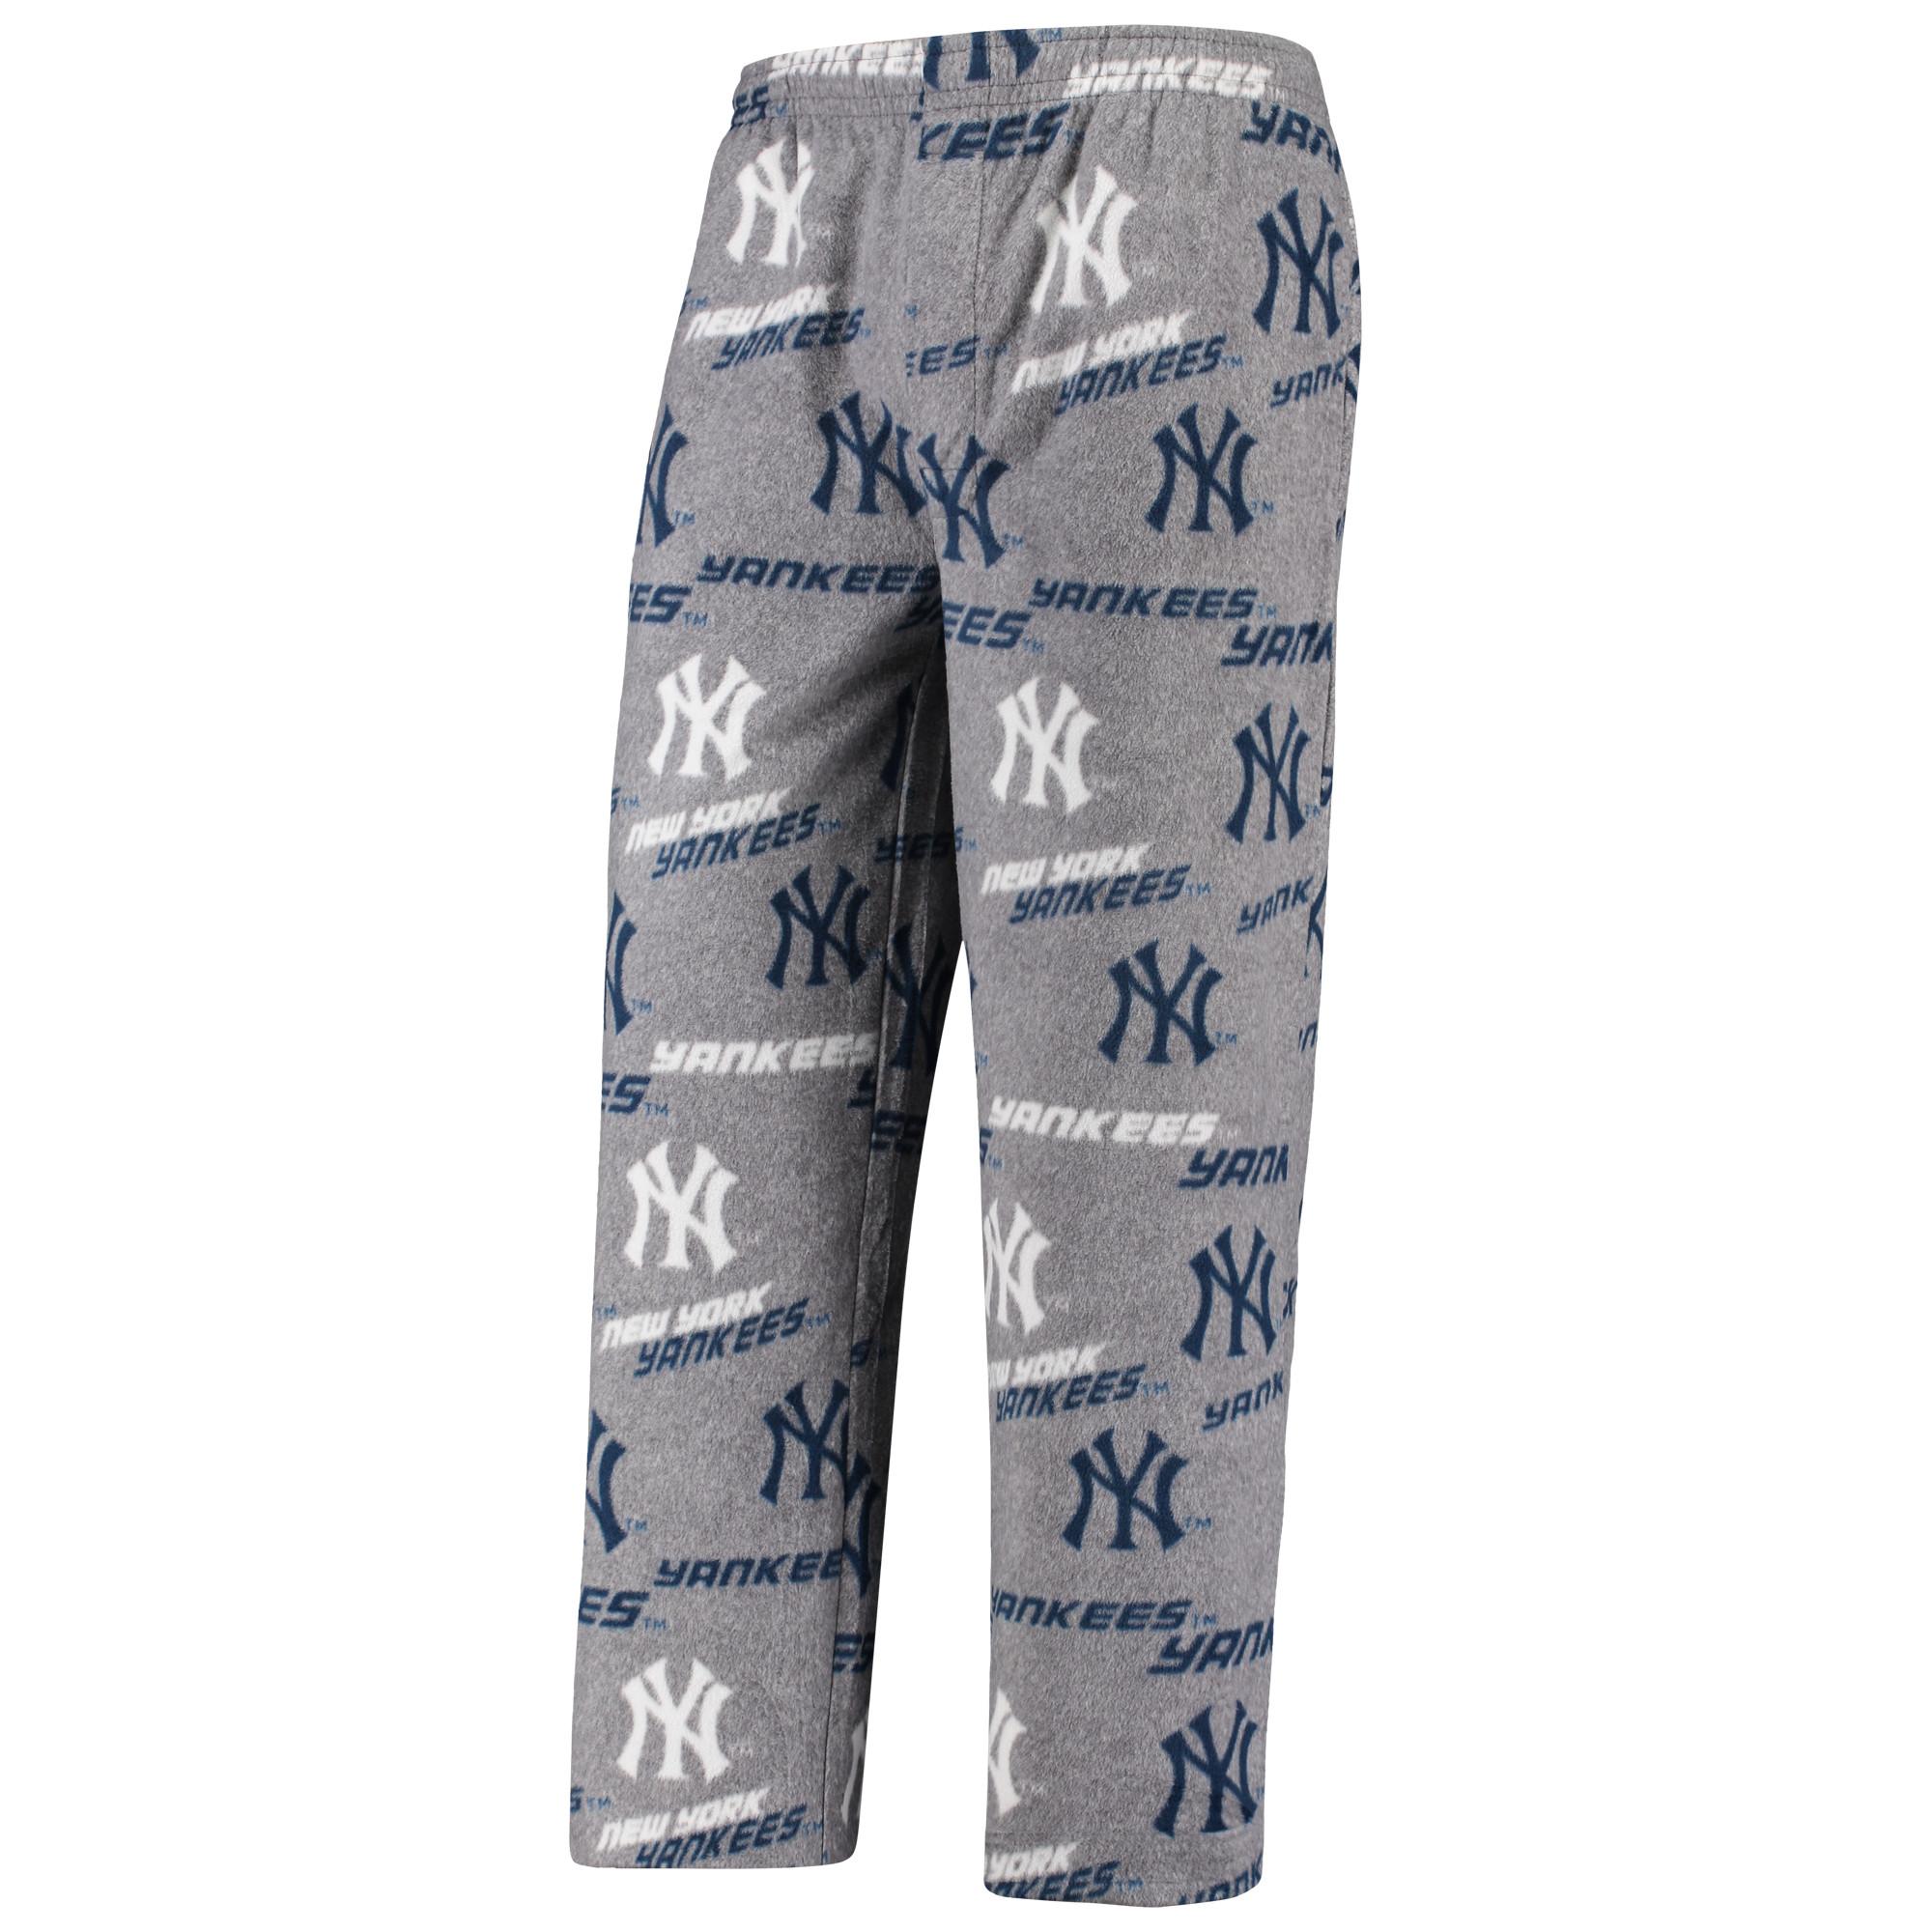 New York Yankees Concepts Sport Achieve Fleece Pants - Gray